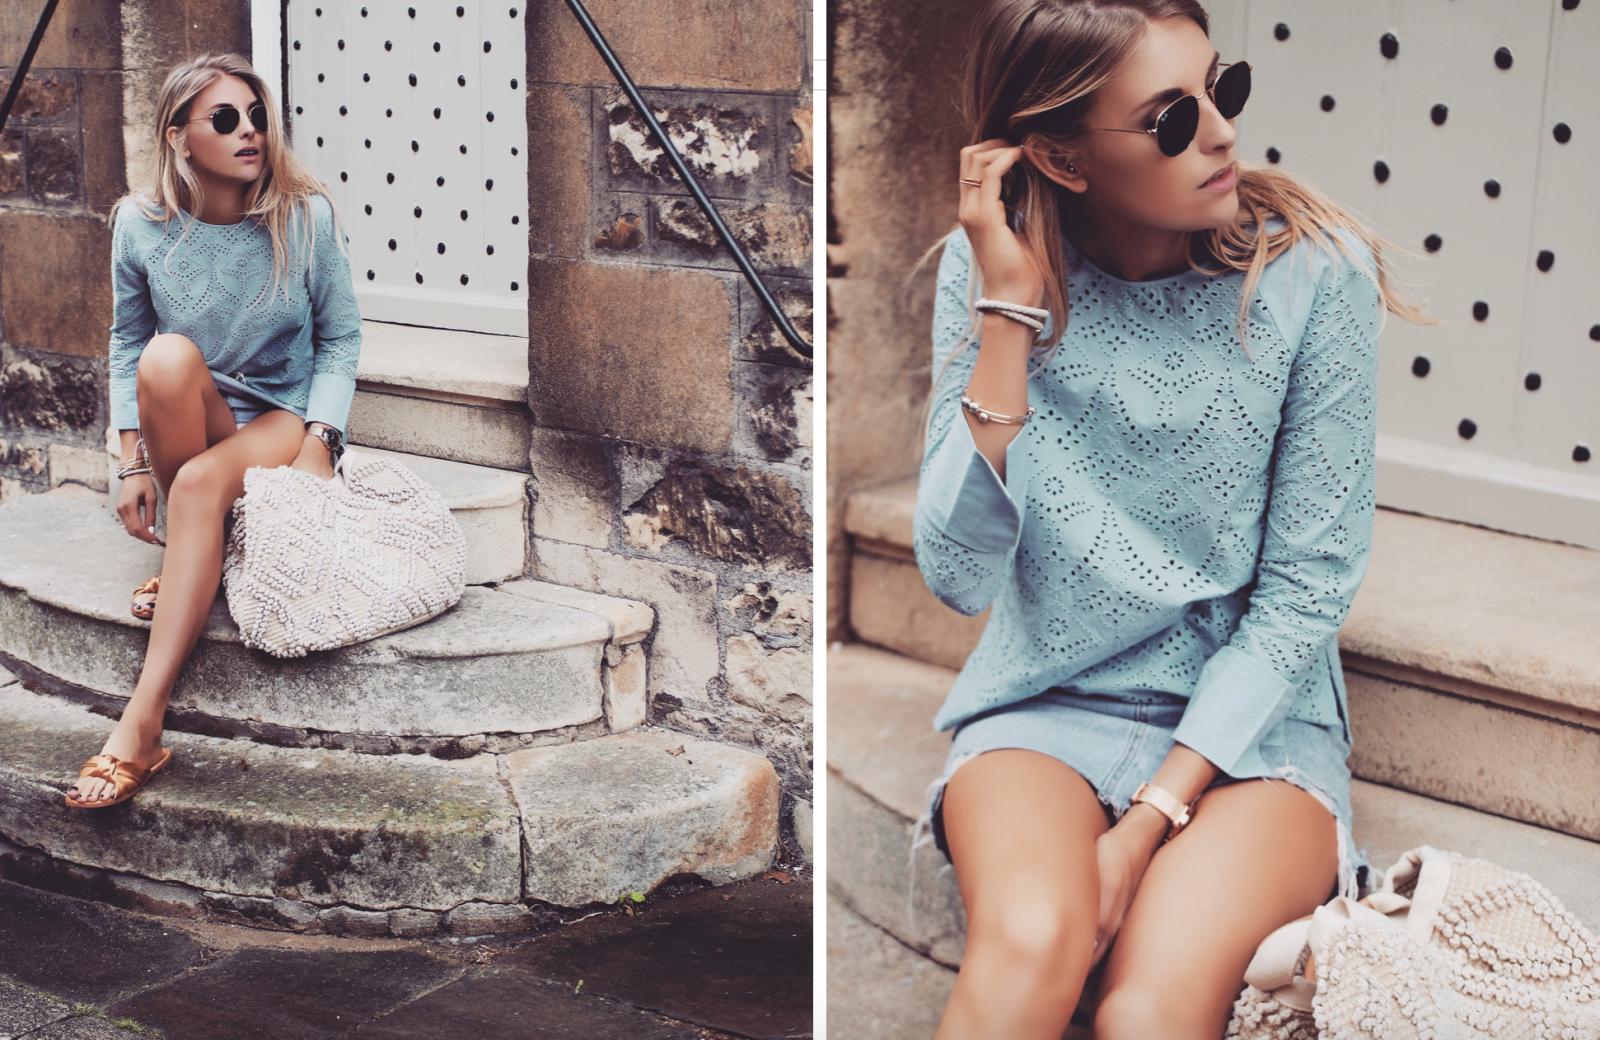 Basket Bag - Fashion Blogger Blue Outfit Post